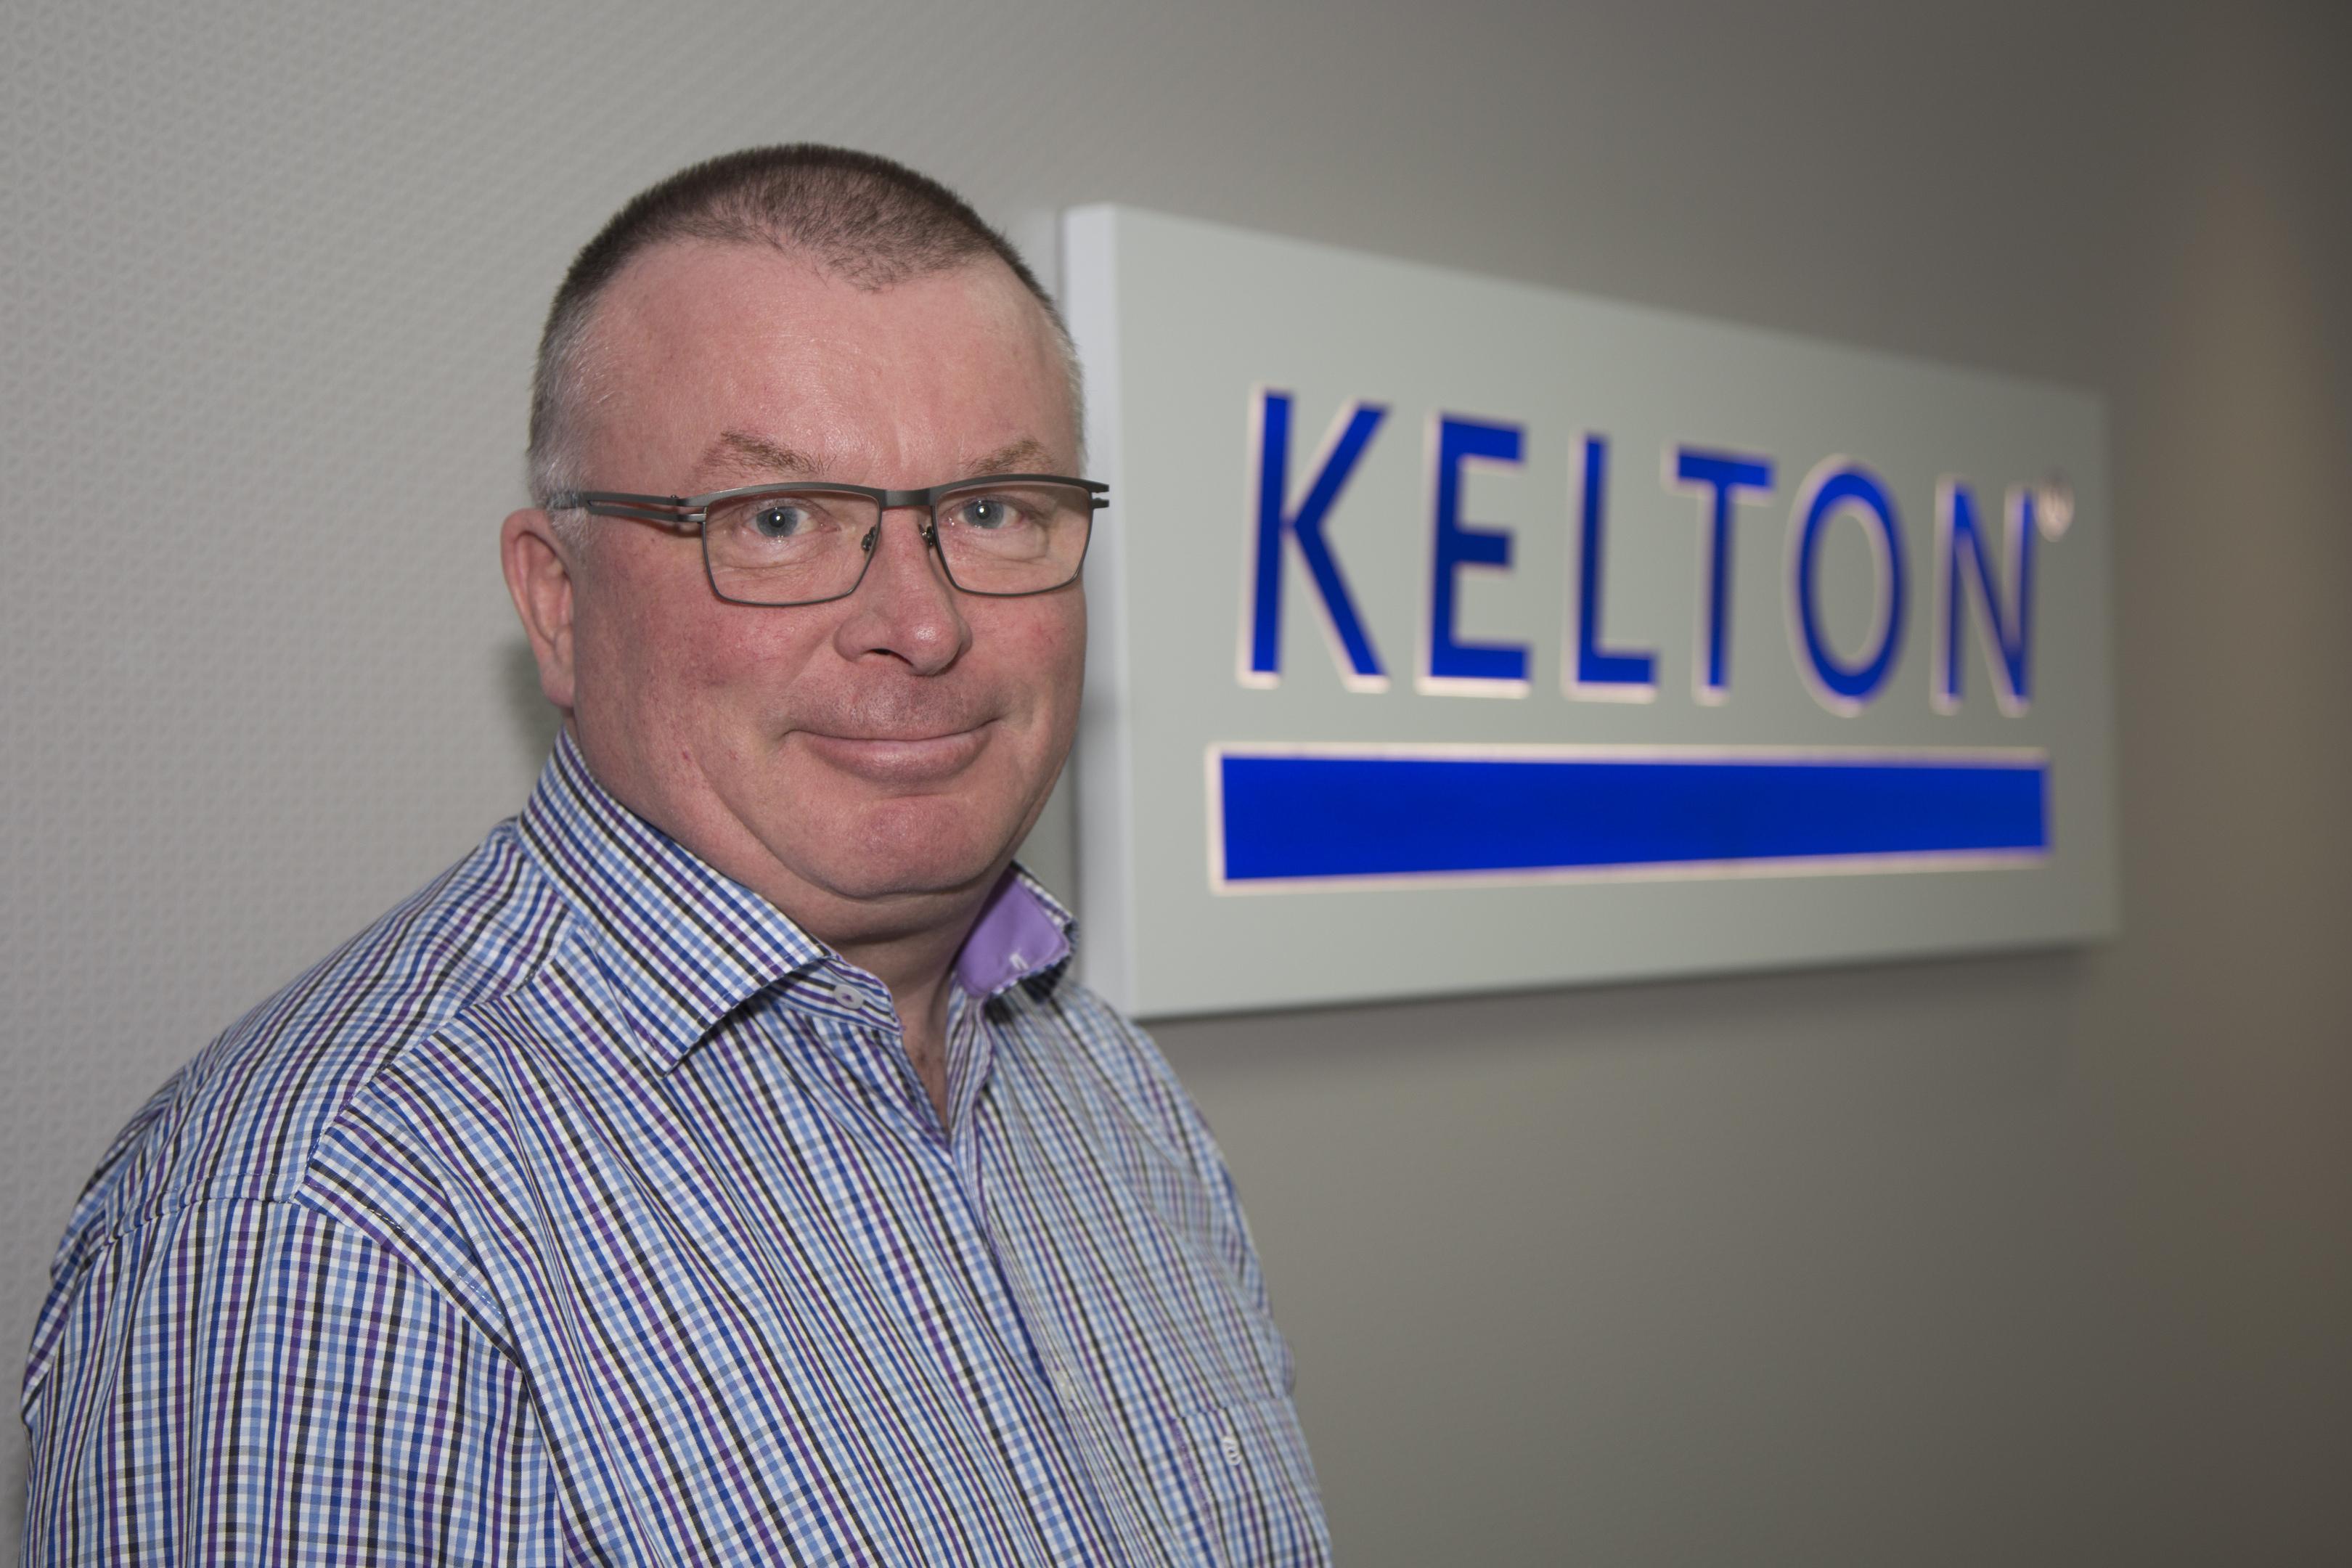 Kelton managing director Iain Pirie